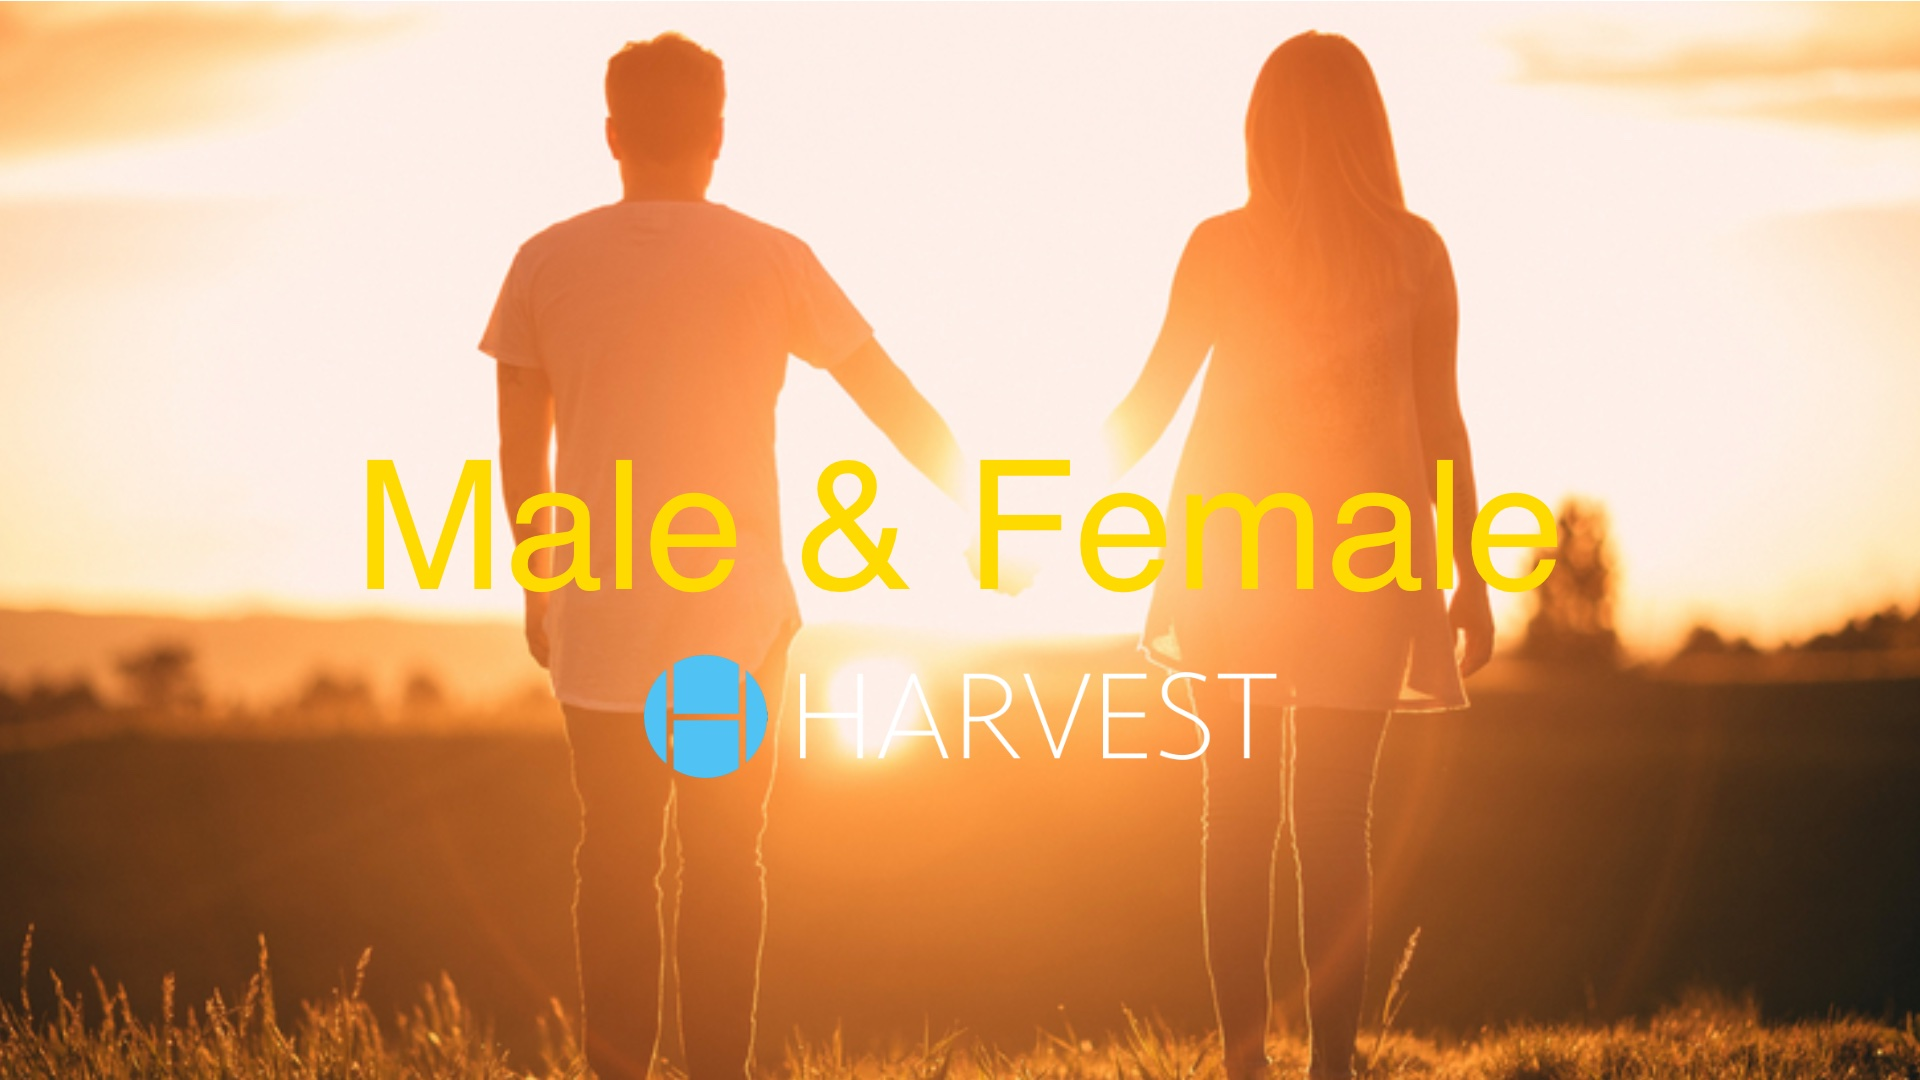 Male & Female